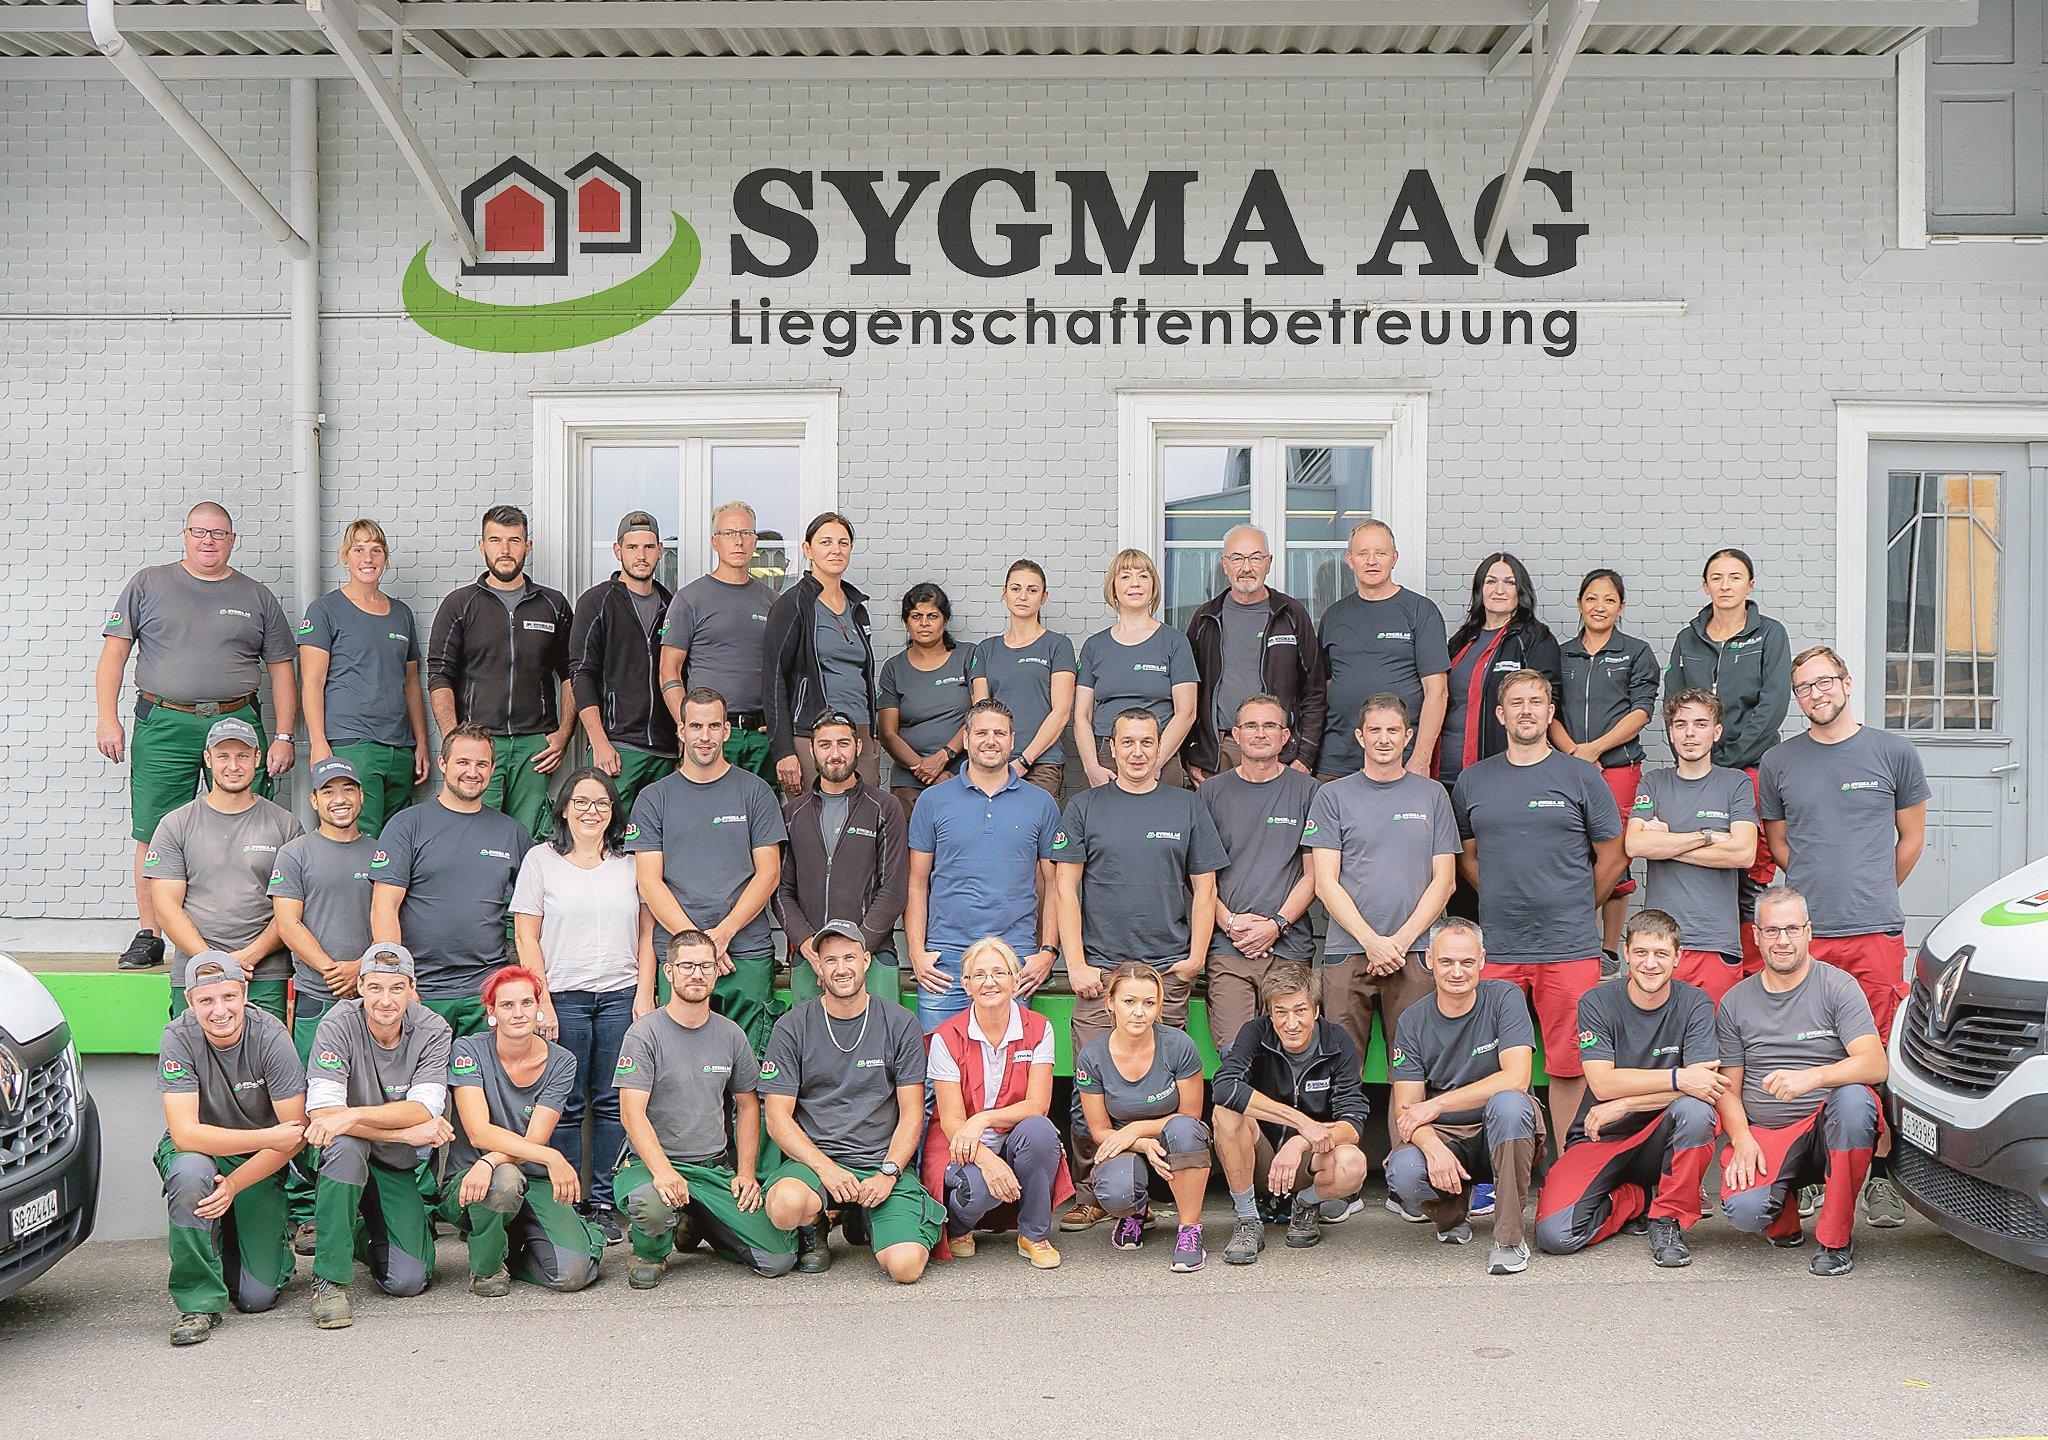 SYGMA AG Liegenschaftenbetreuung